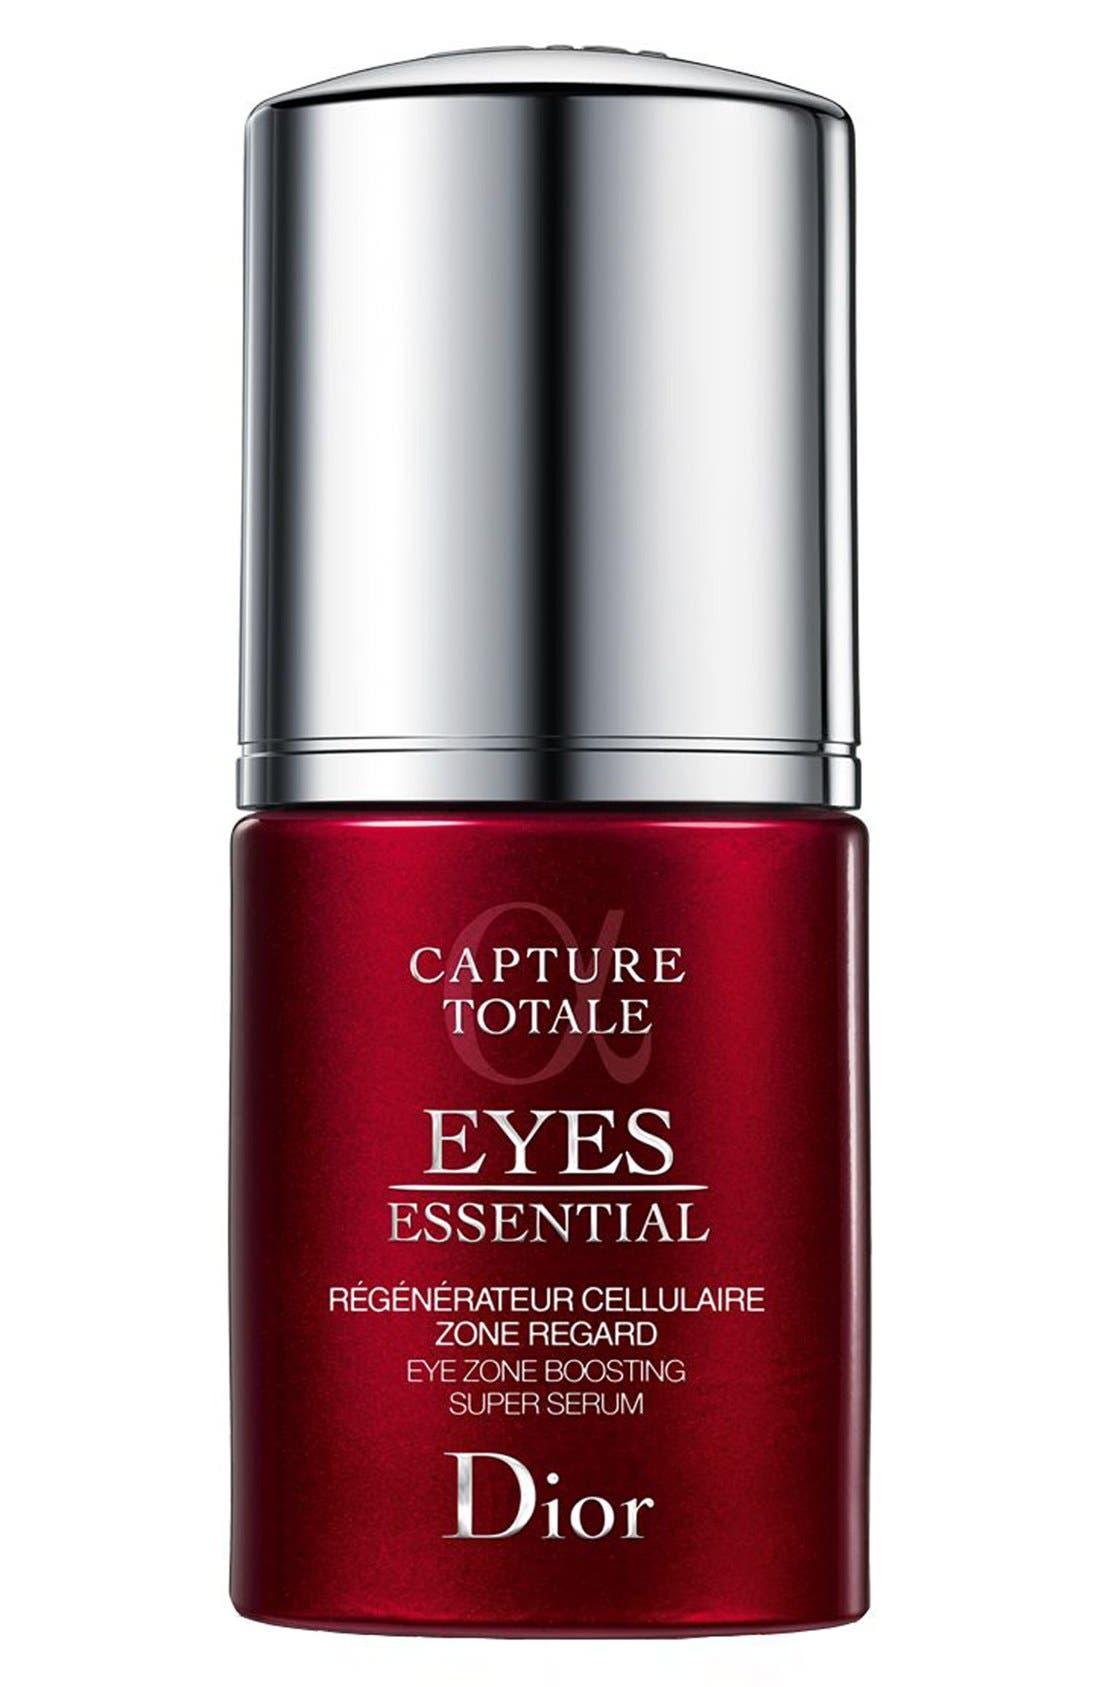 'Capture Totale Eyes Essential' Eye Zone Boosting Super Serum,                         Main,                         color, 000